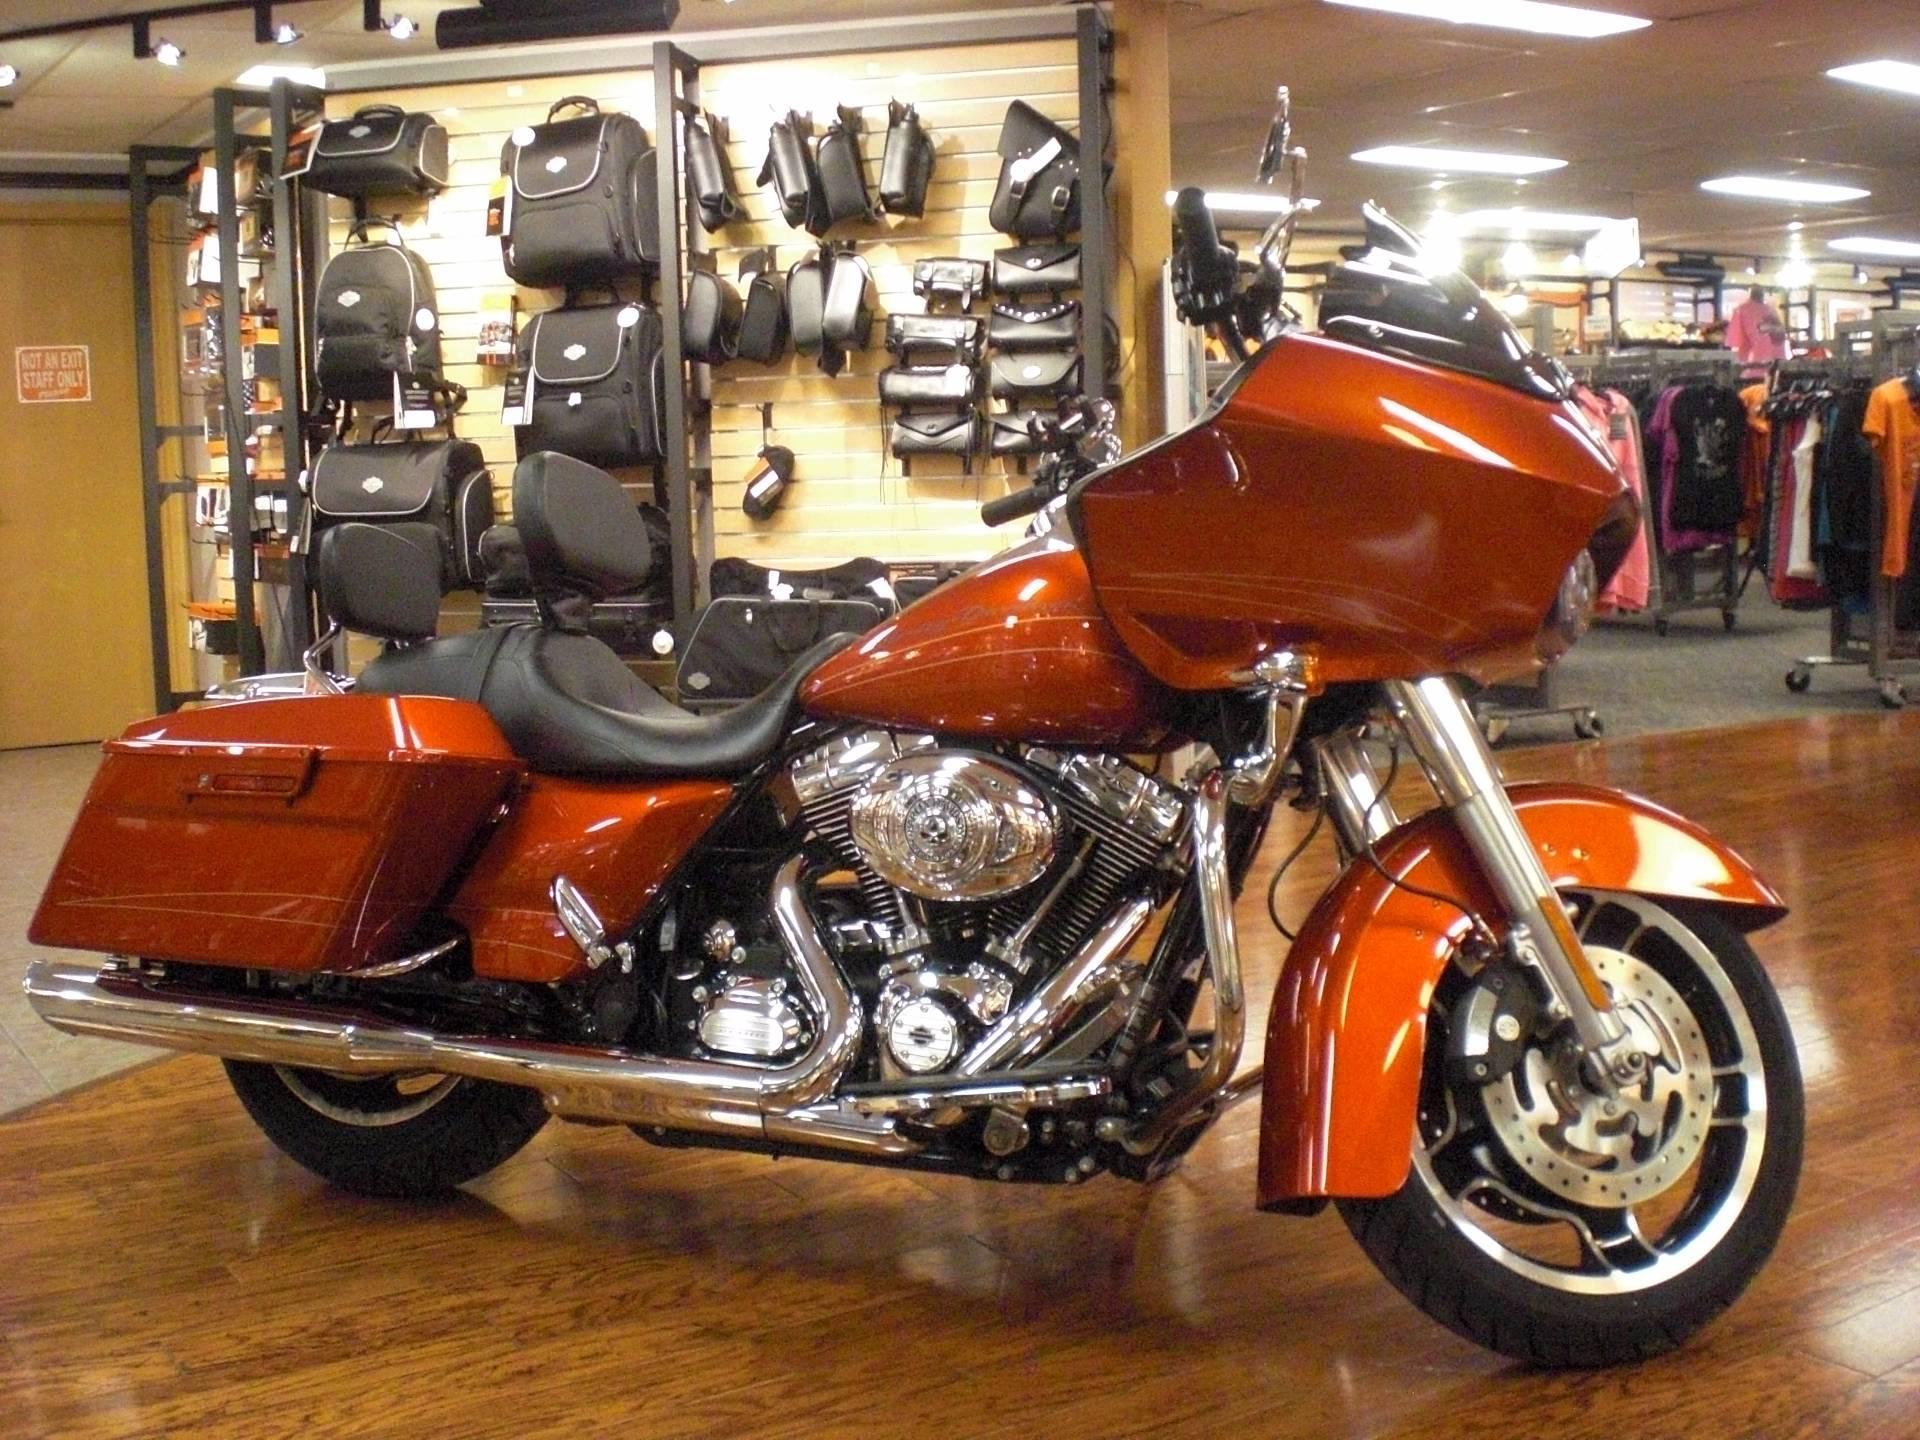 2013 Harley-Davidson Road Glide® Custom in Fort Wayne, Indiana